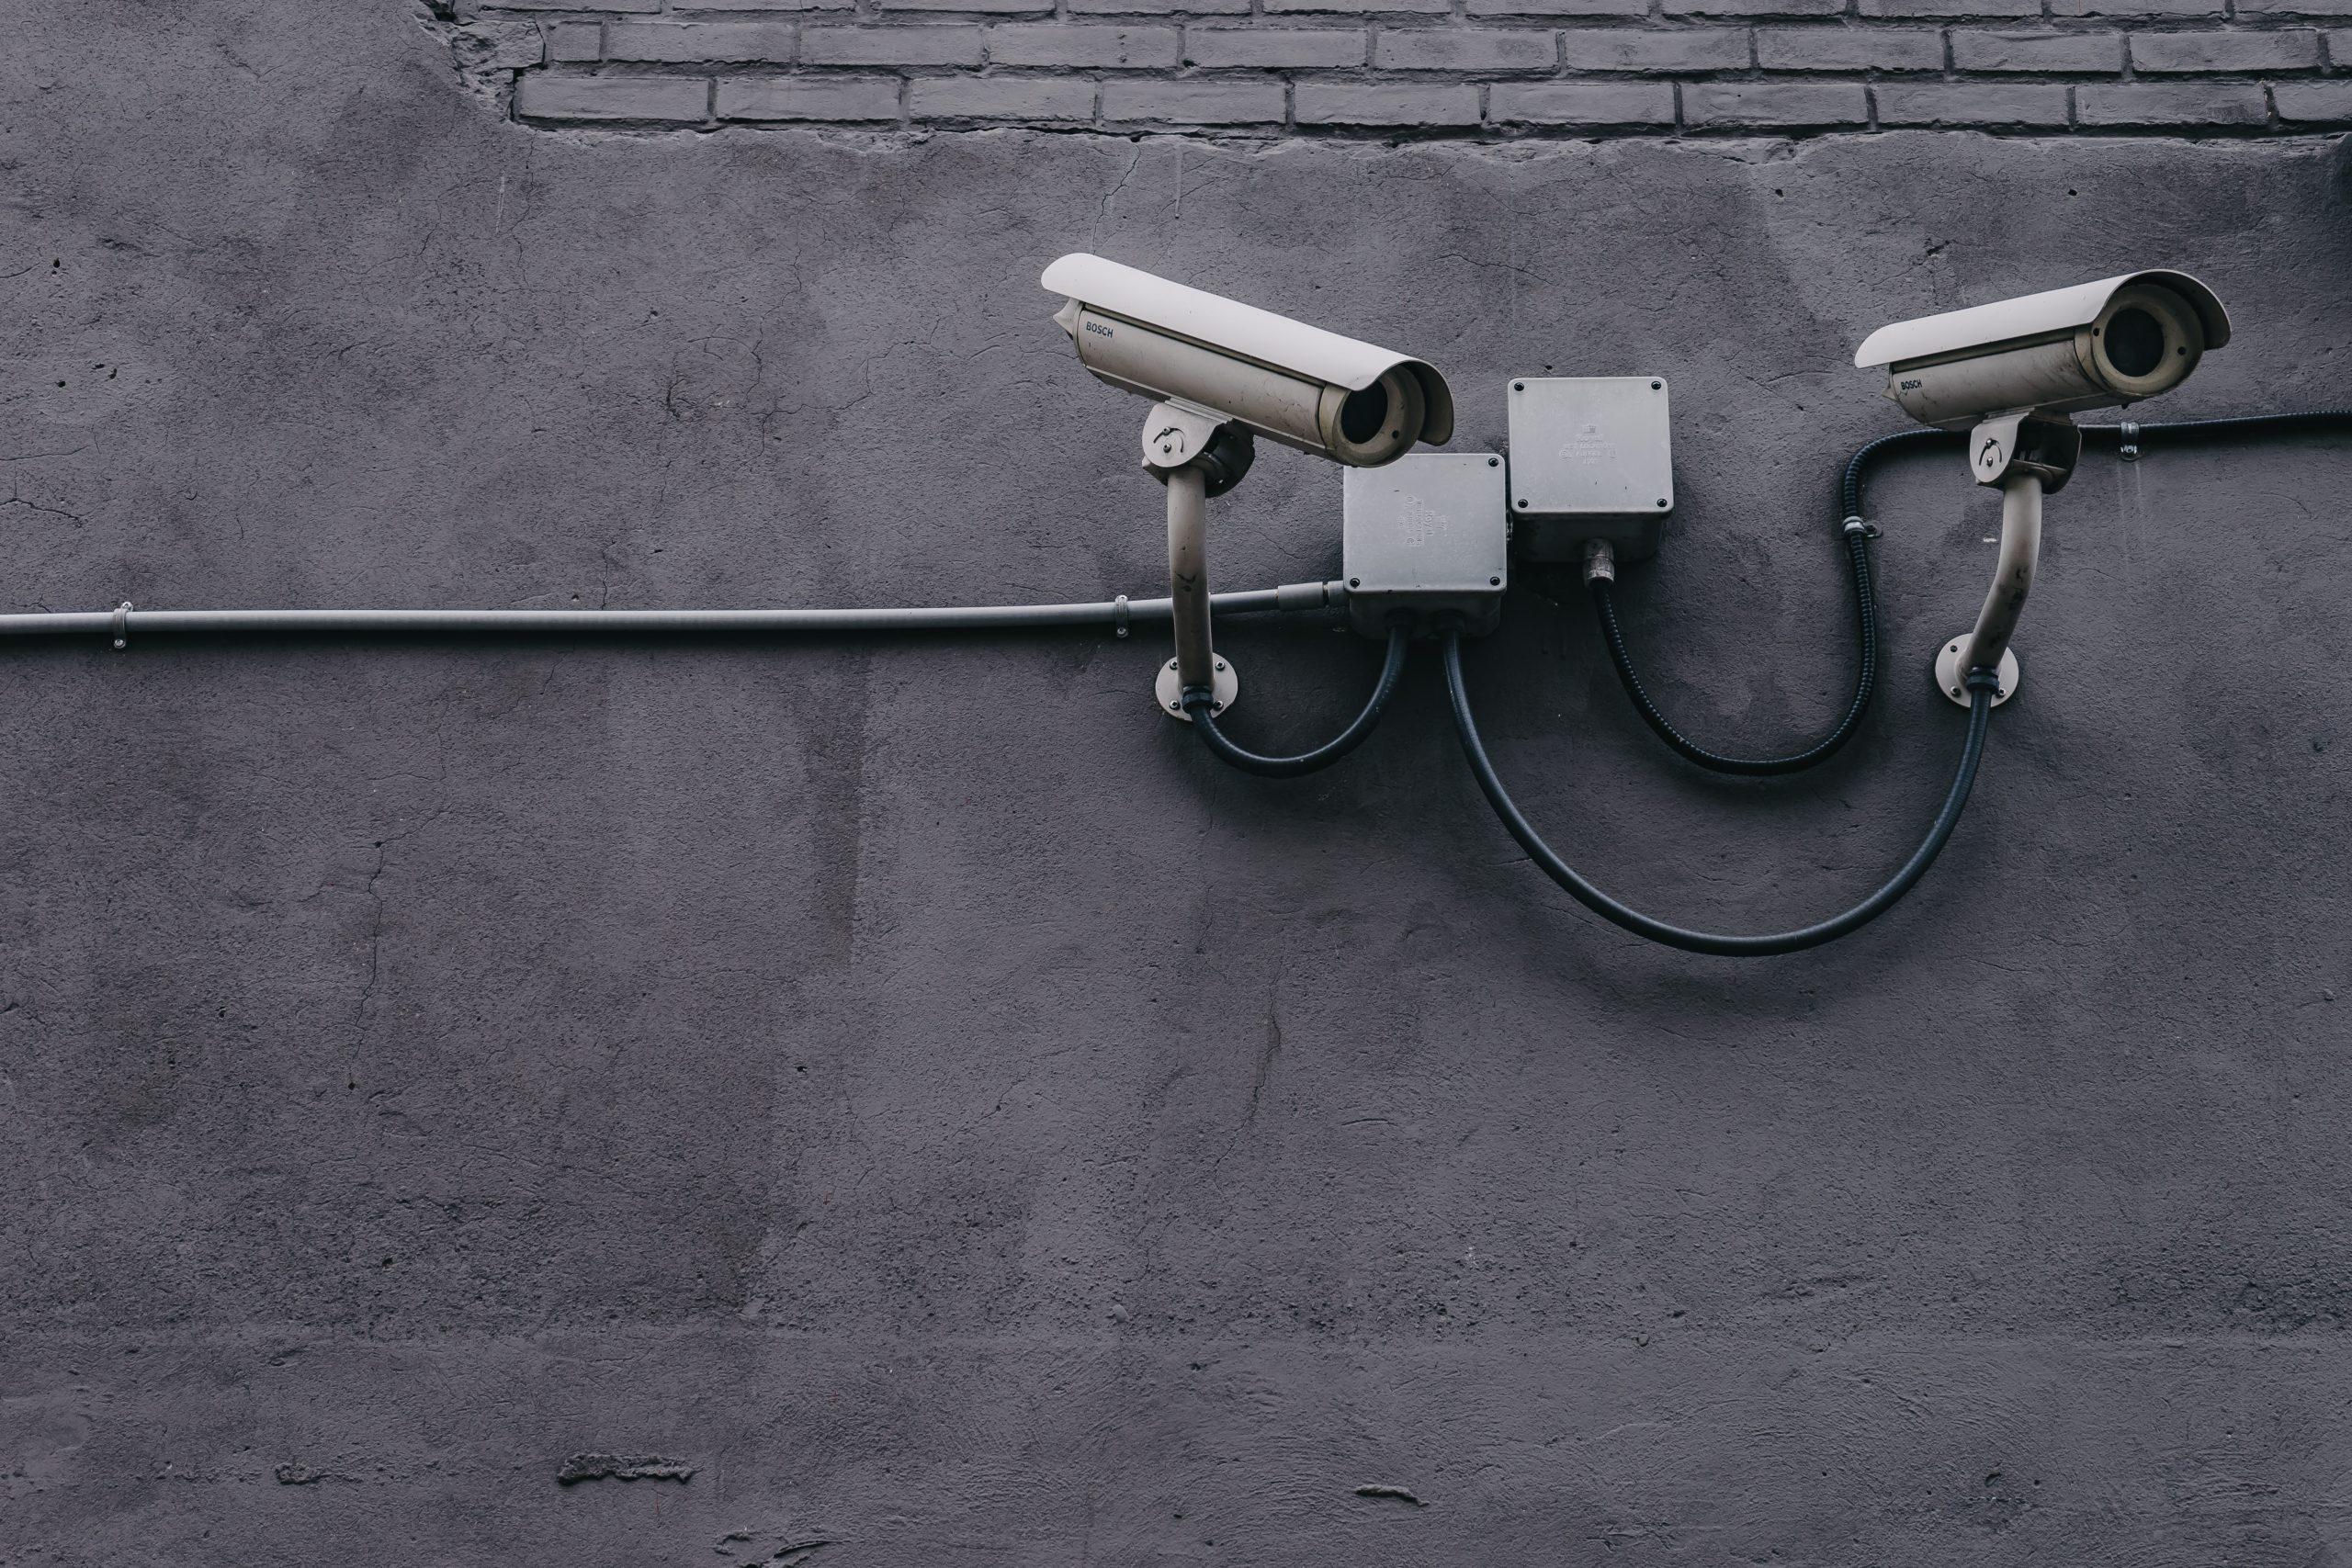 CCTV security installations